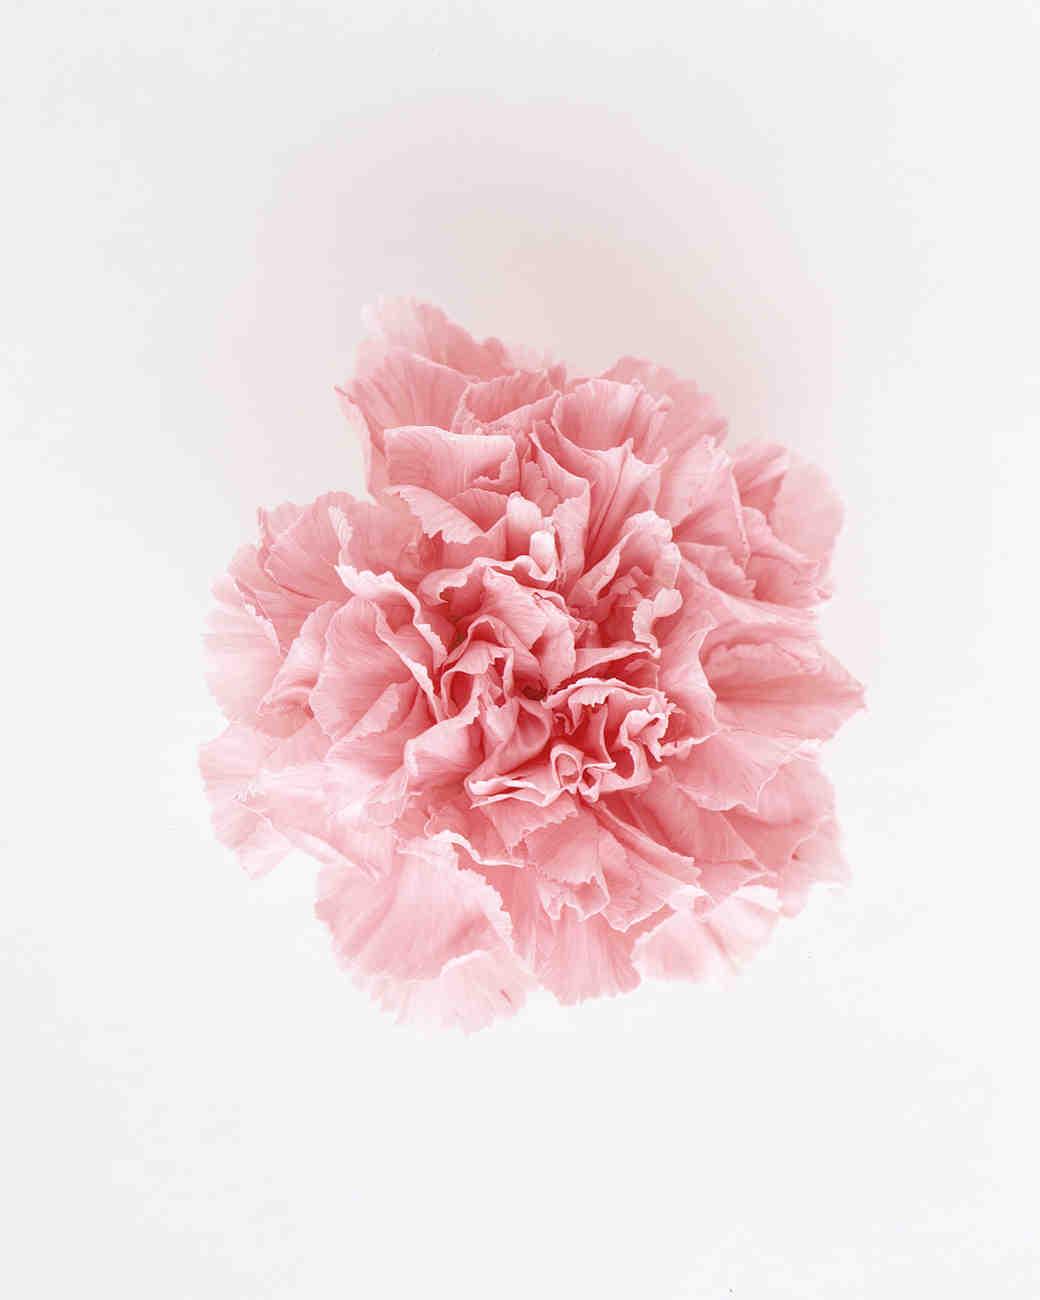 flower-glossary-carnation-pink-a98432-0415.jpg